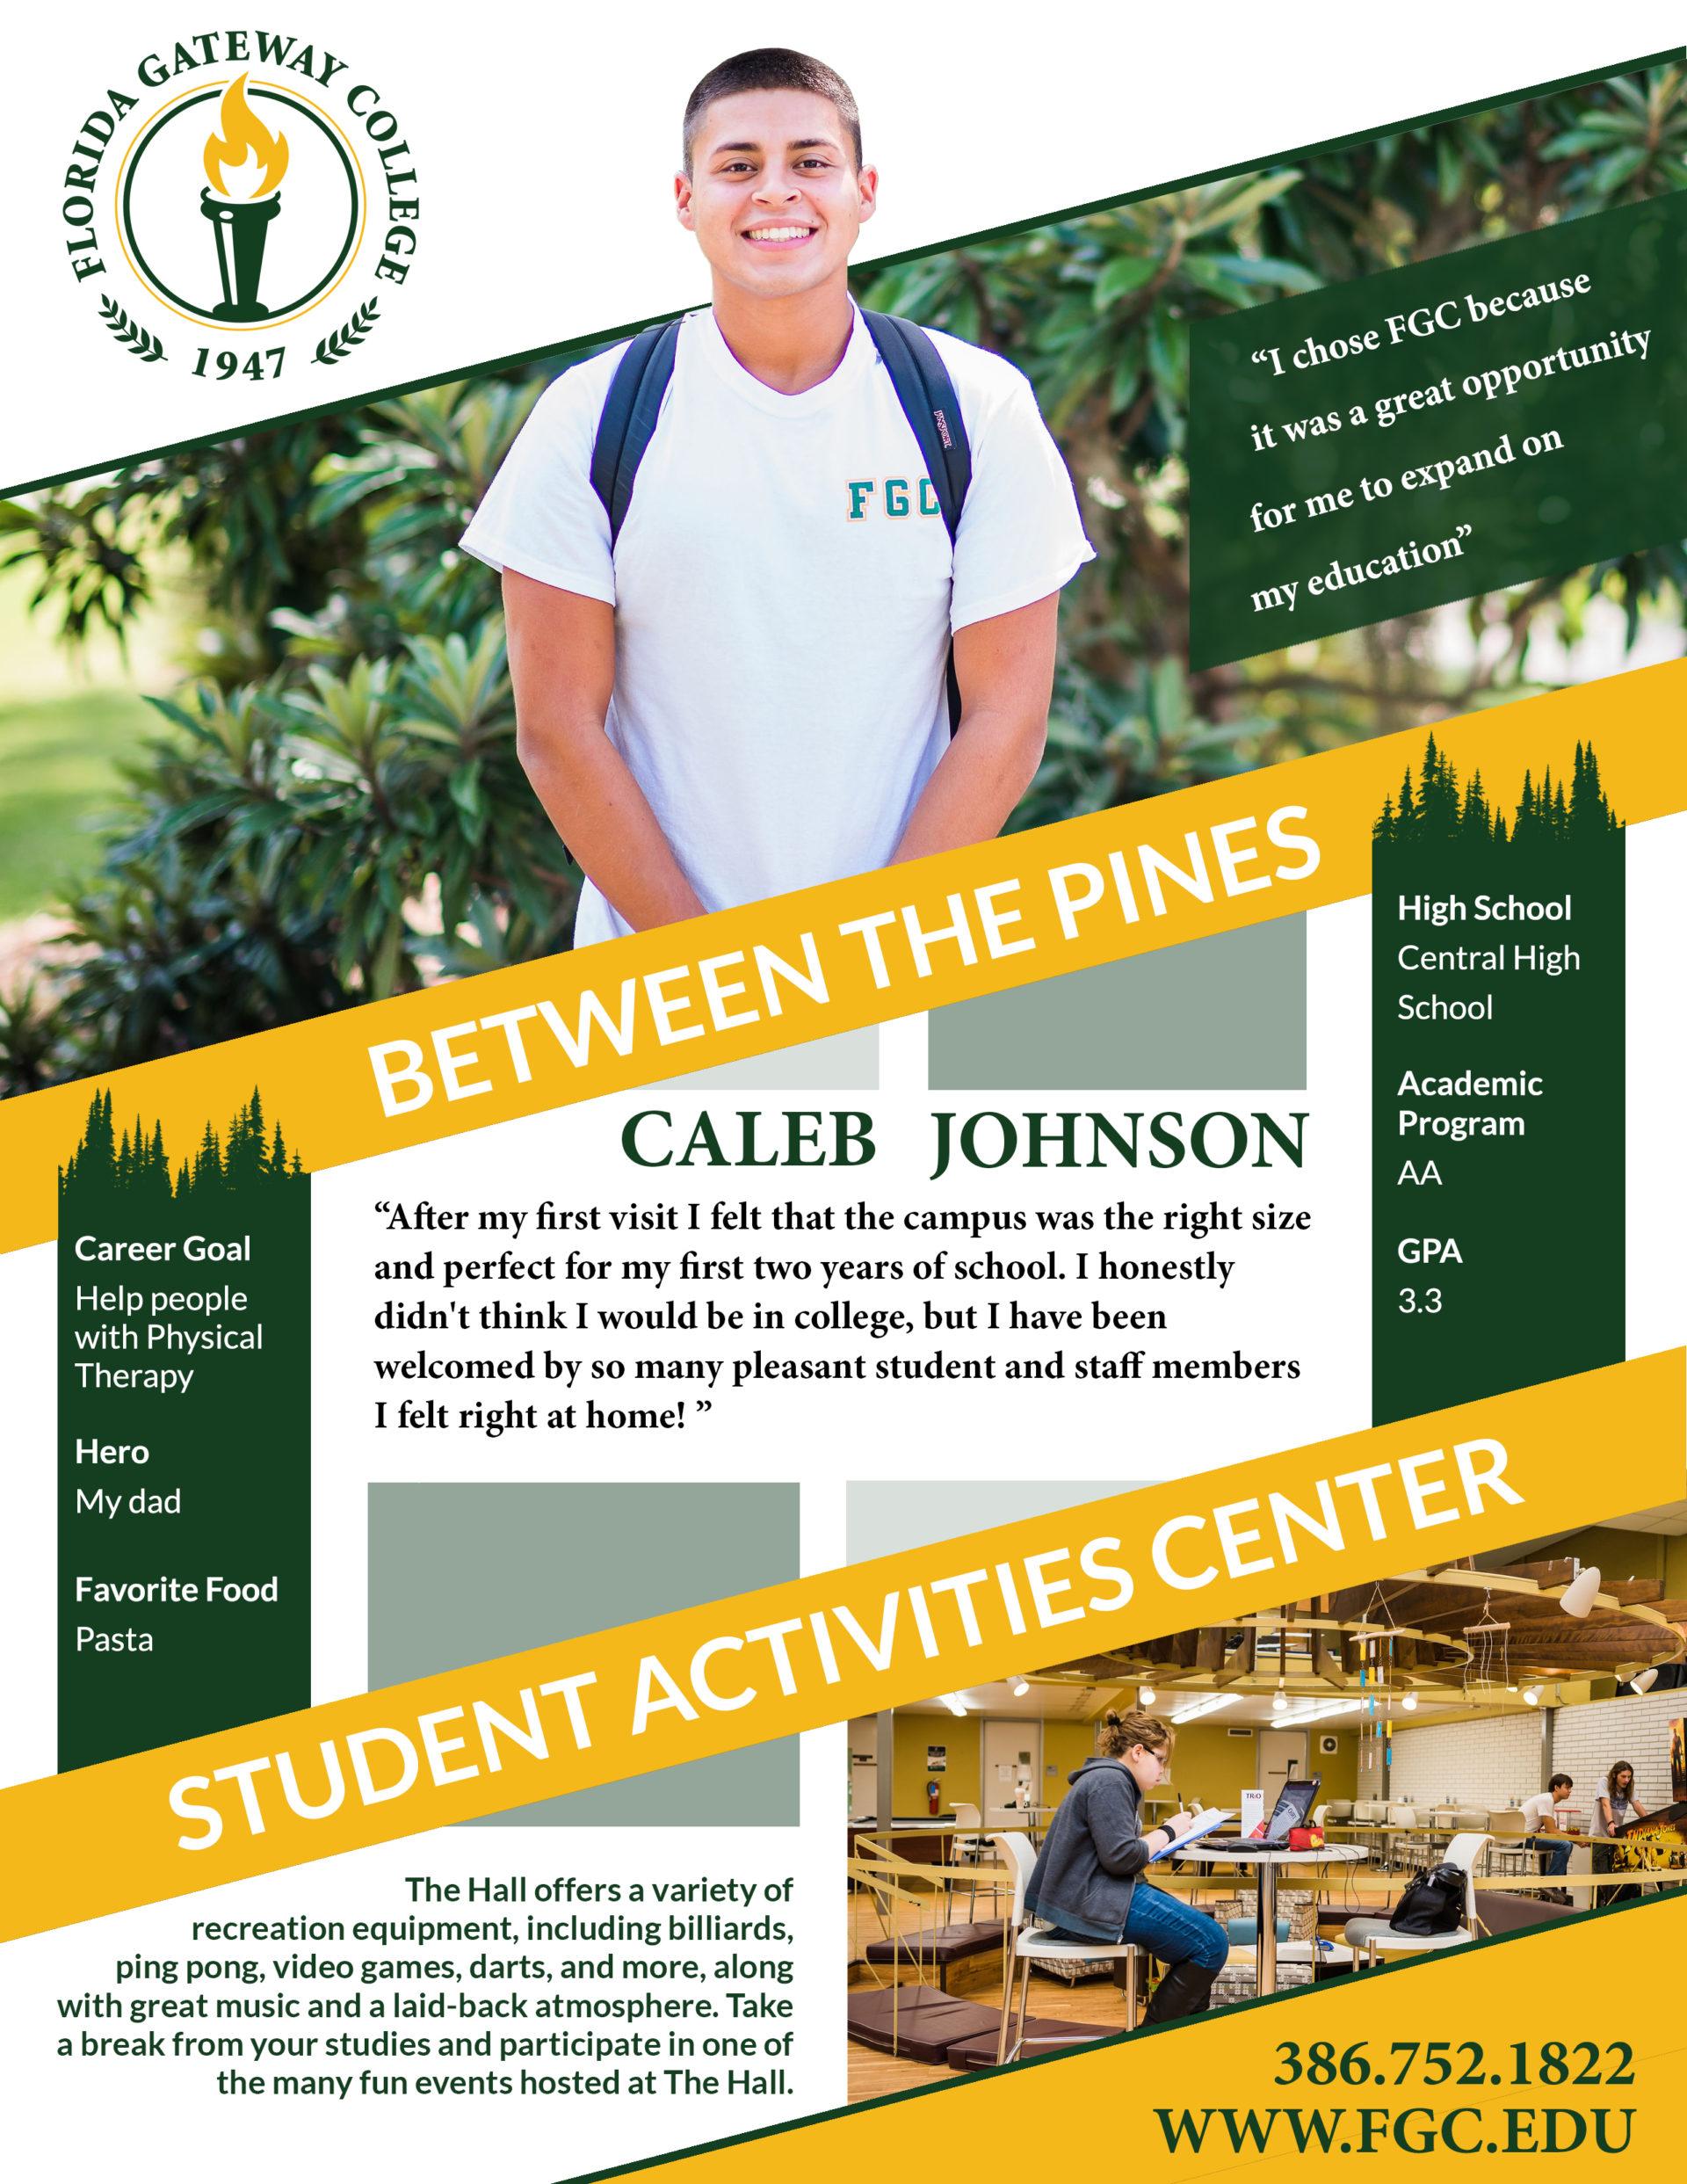 Caleb Johnson's Story